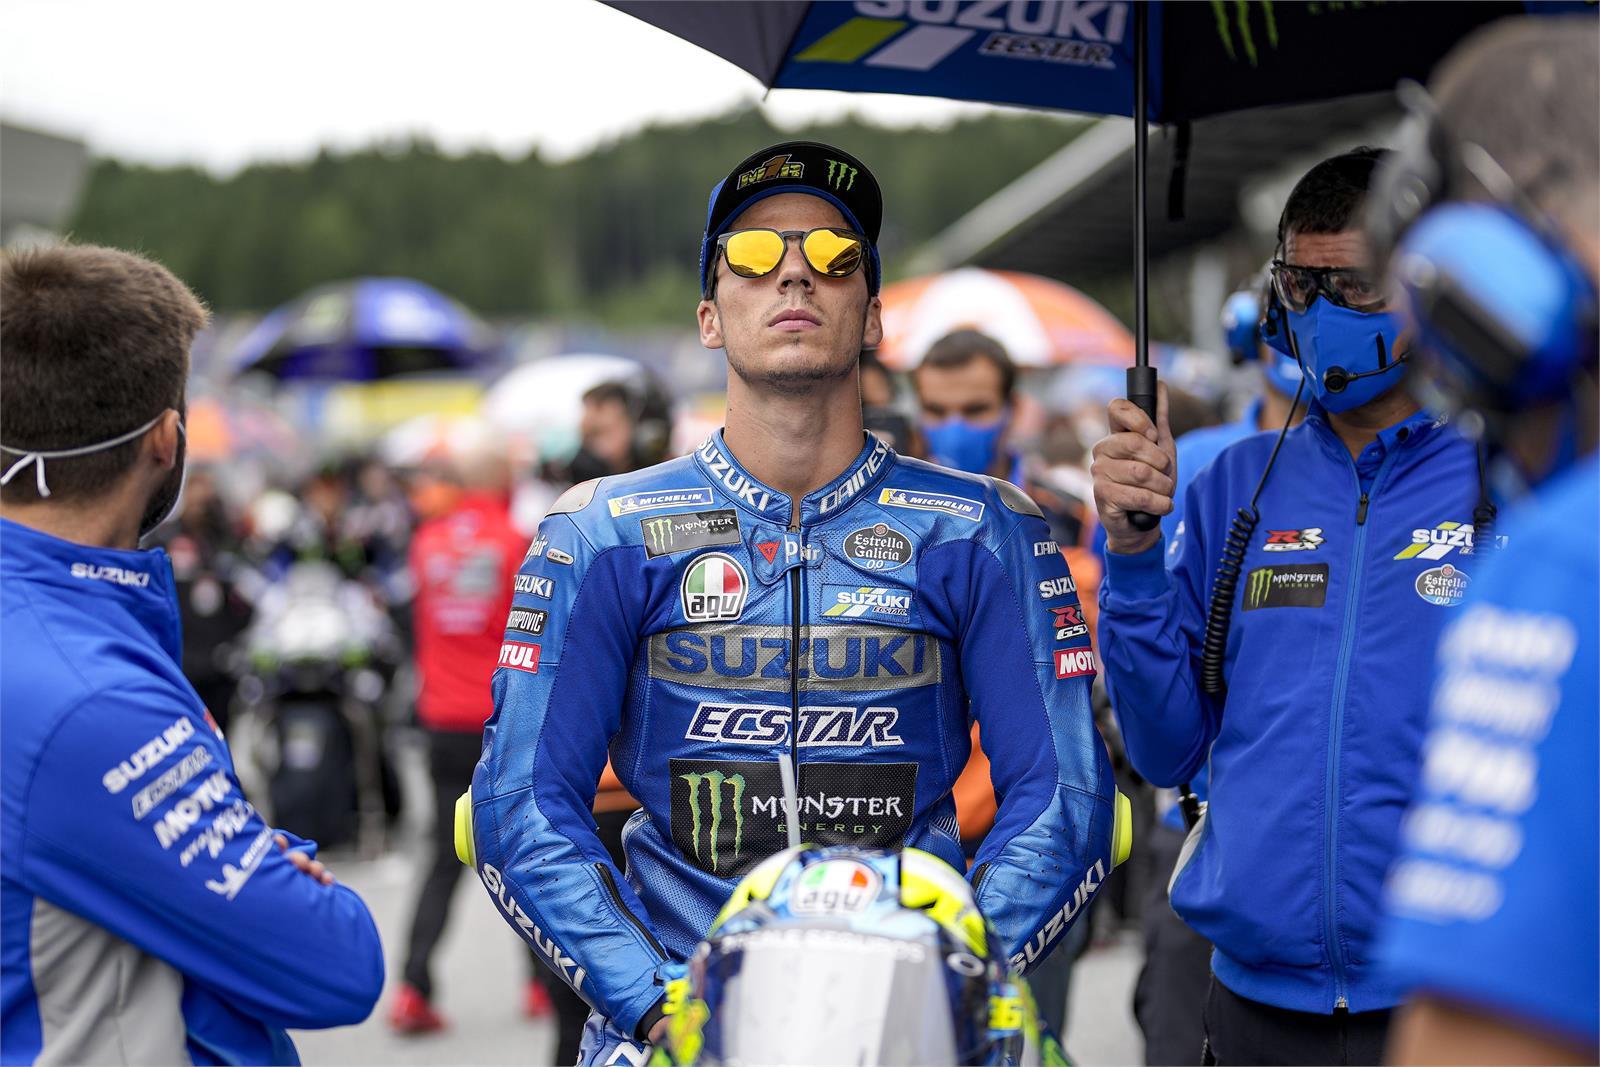 MotoGP2021オーストリアGP ジョアン・ミル「今週末は優勝を狙っていく」